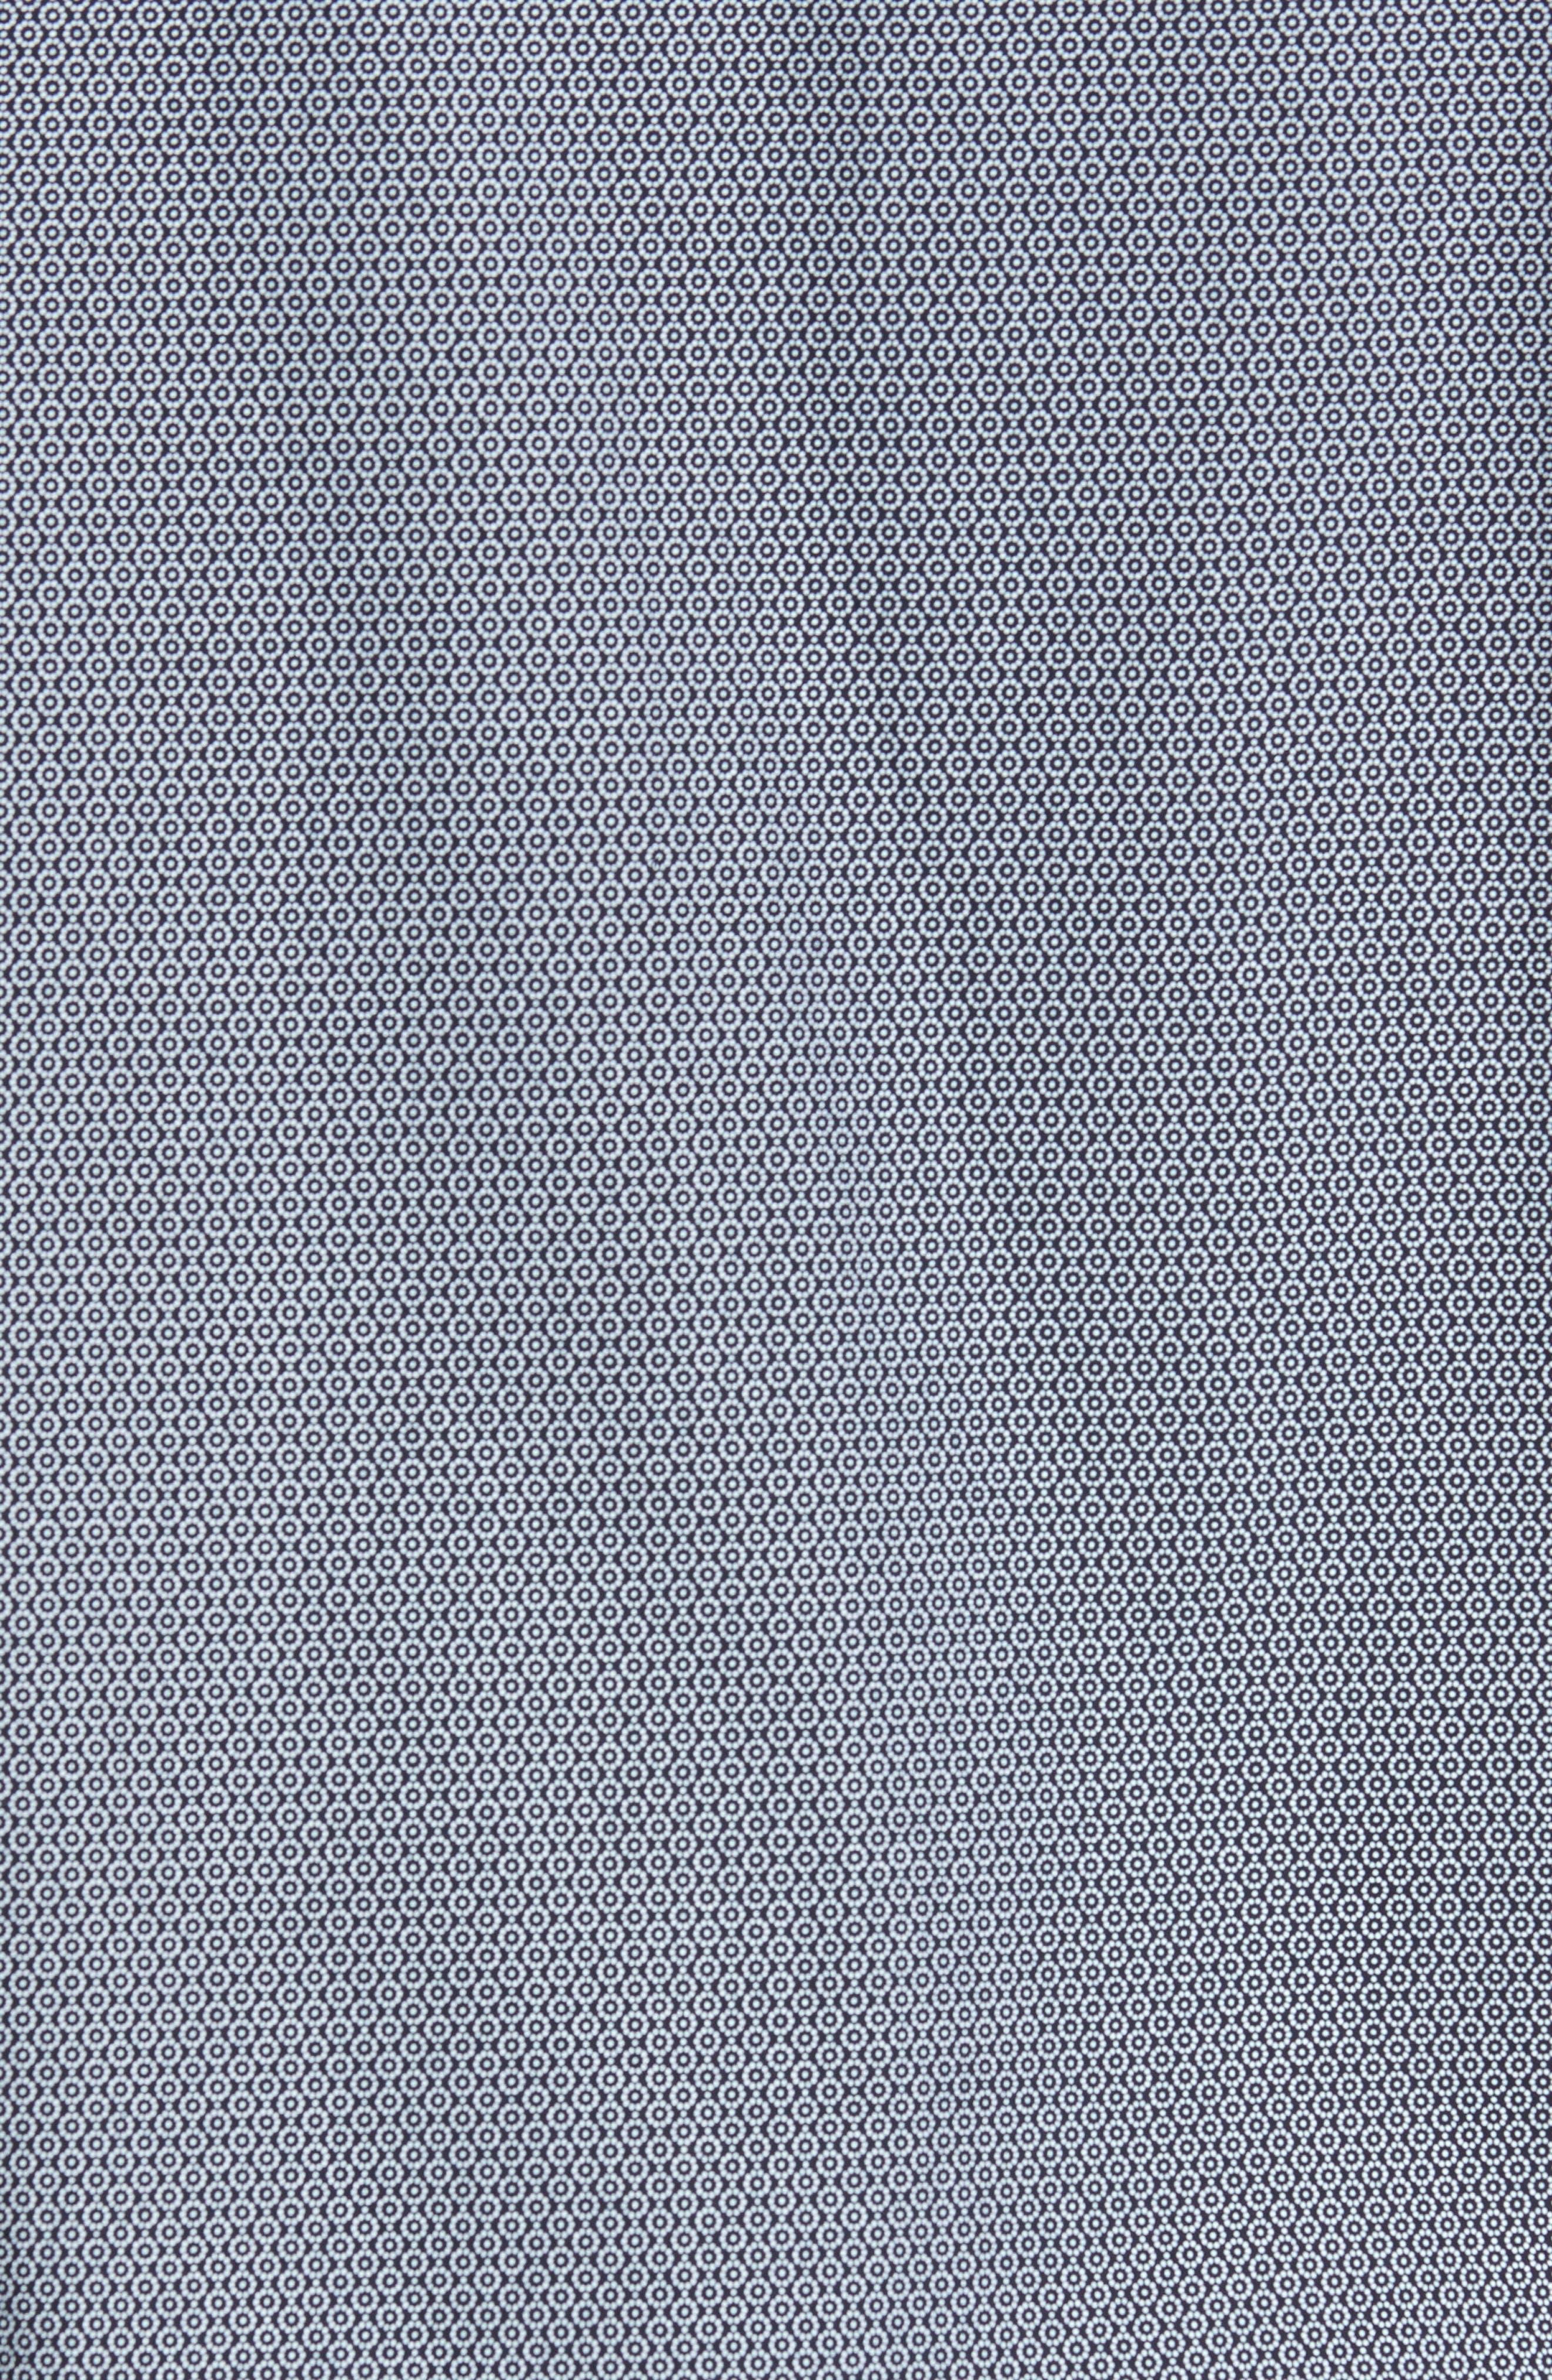 Alternate Image 5  - Nordstrom Men's Shop Slim Fit Non-Iron Dot Print Sport Shirt